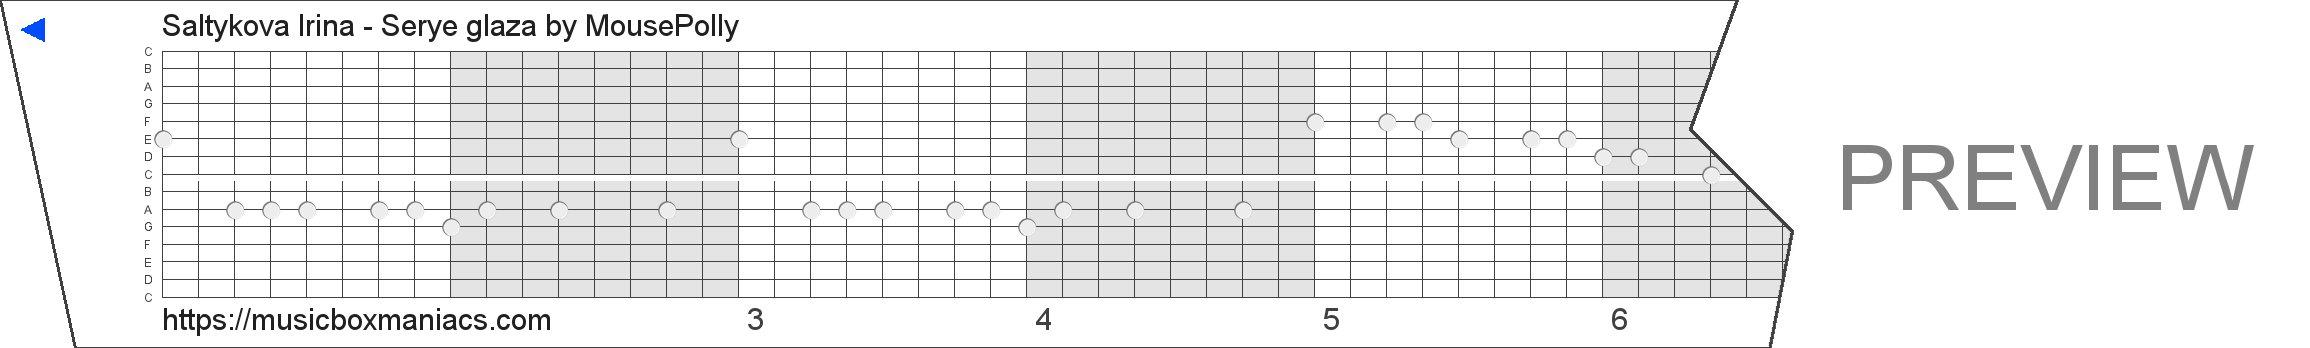 Saltykova Irina - Serye glaza 15 note music box paper strip